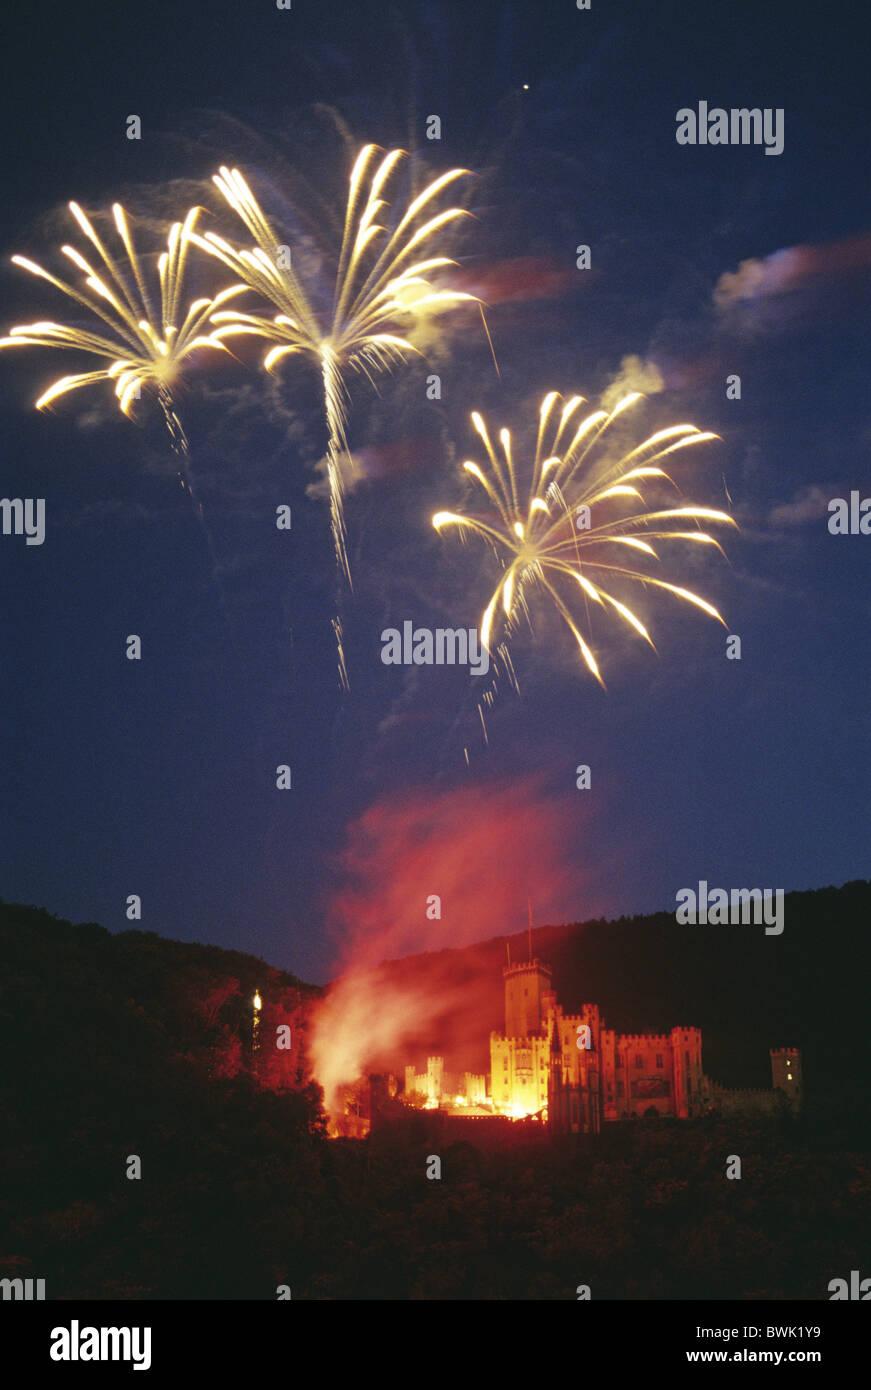 Fireworks at Stolzenfels castle, Rhein in Flammen, near Koblenz, Rhine, Rhineland-Palatinate, Germany - Stock Image